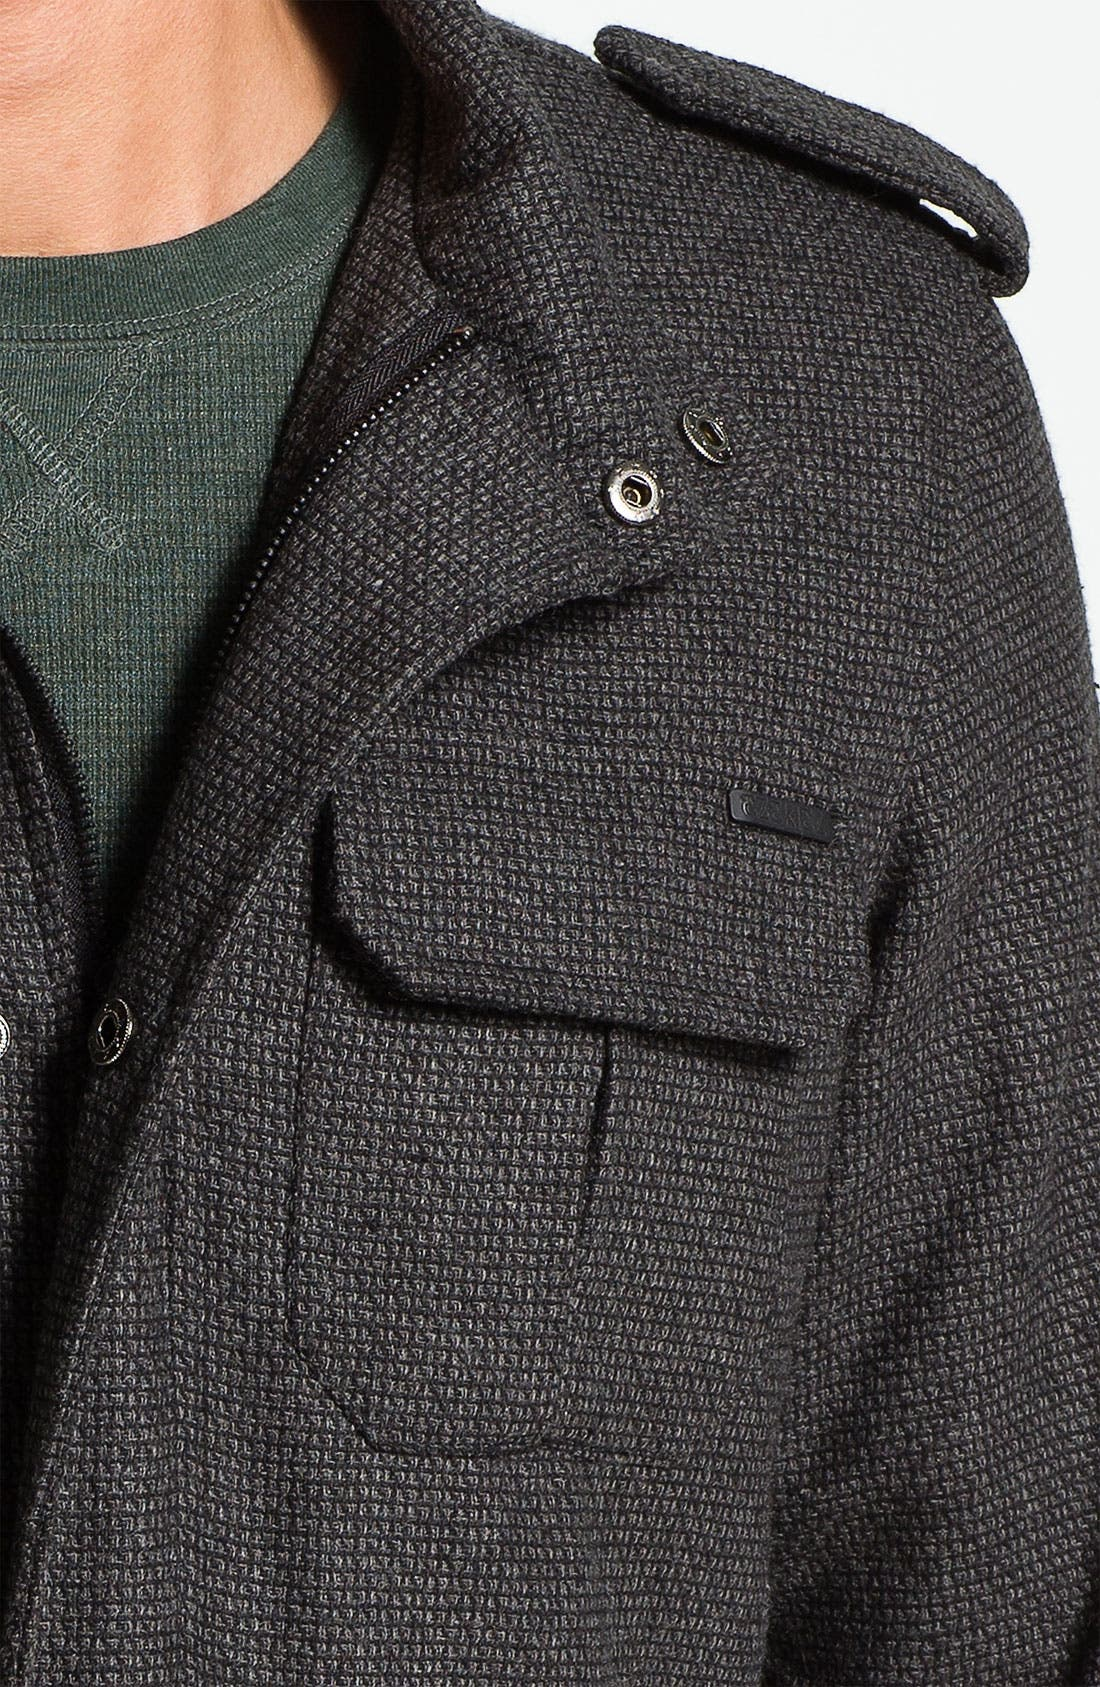 Alternate Image 3  - Ezekiel 'Predator' Tweed Jacket